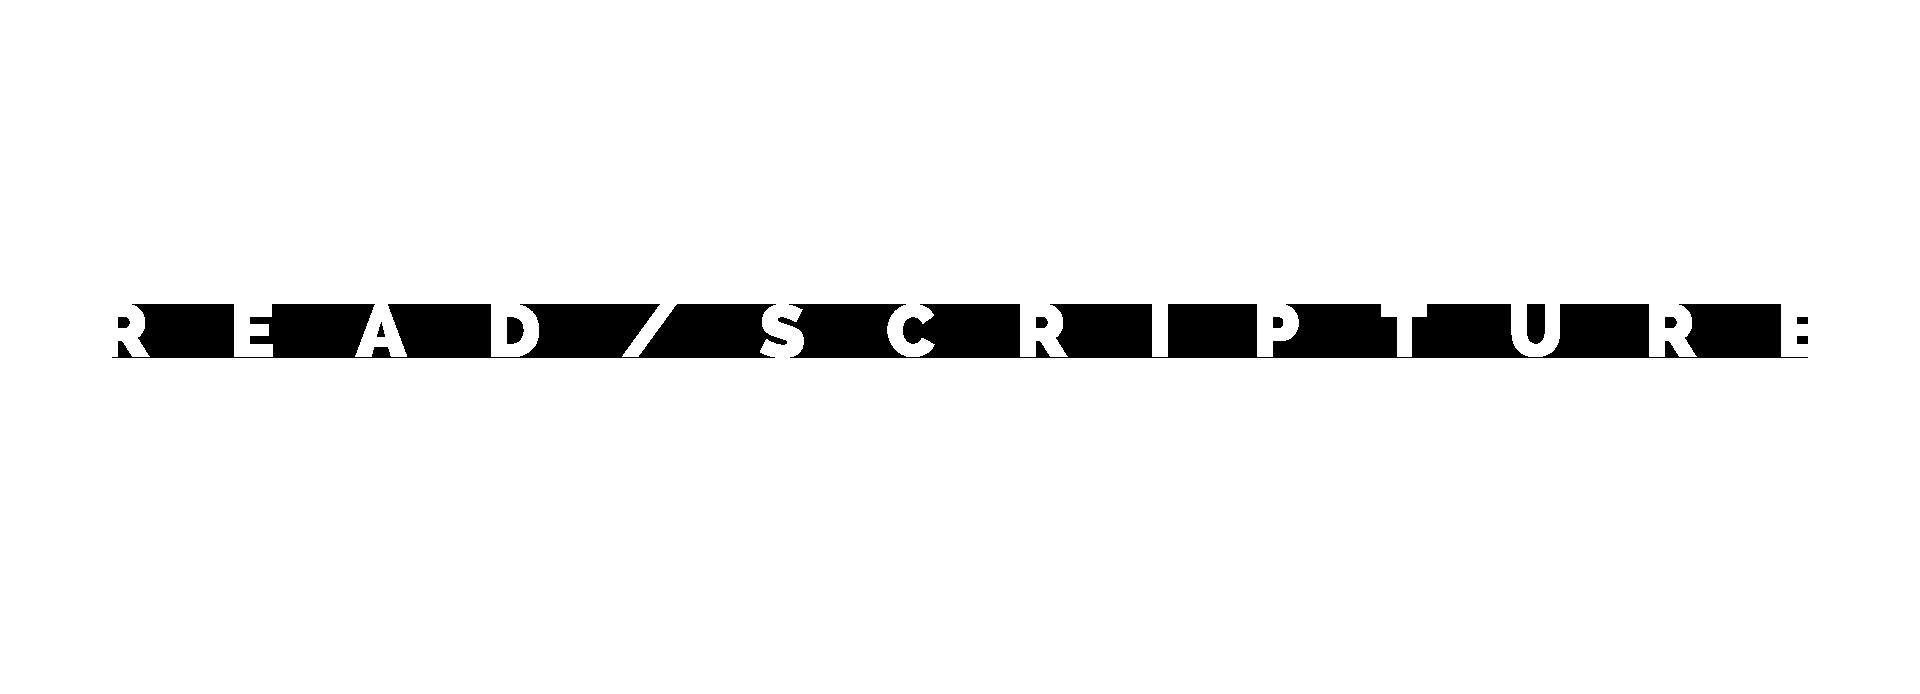 read_scripture